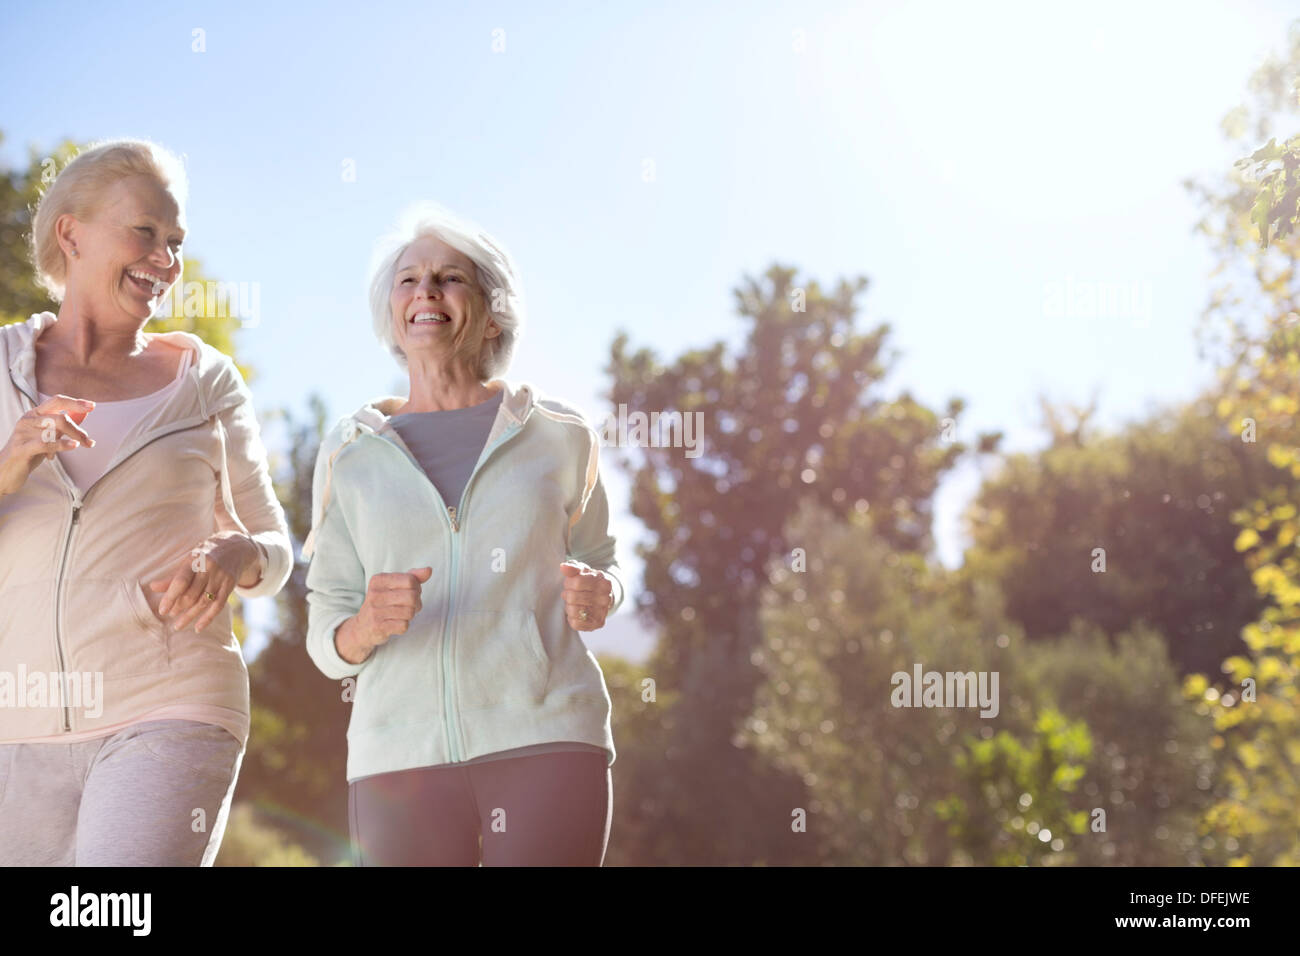 Senior women running outdoors - Stock Image